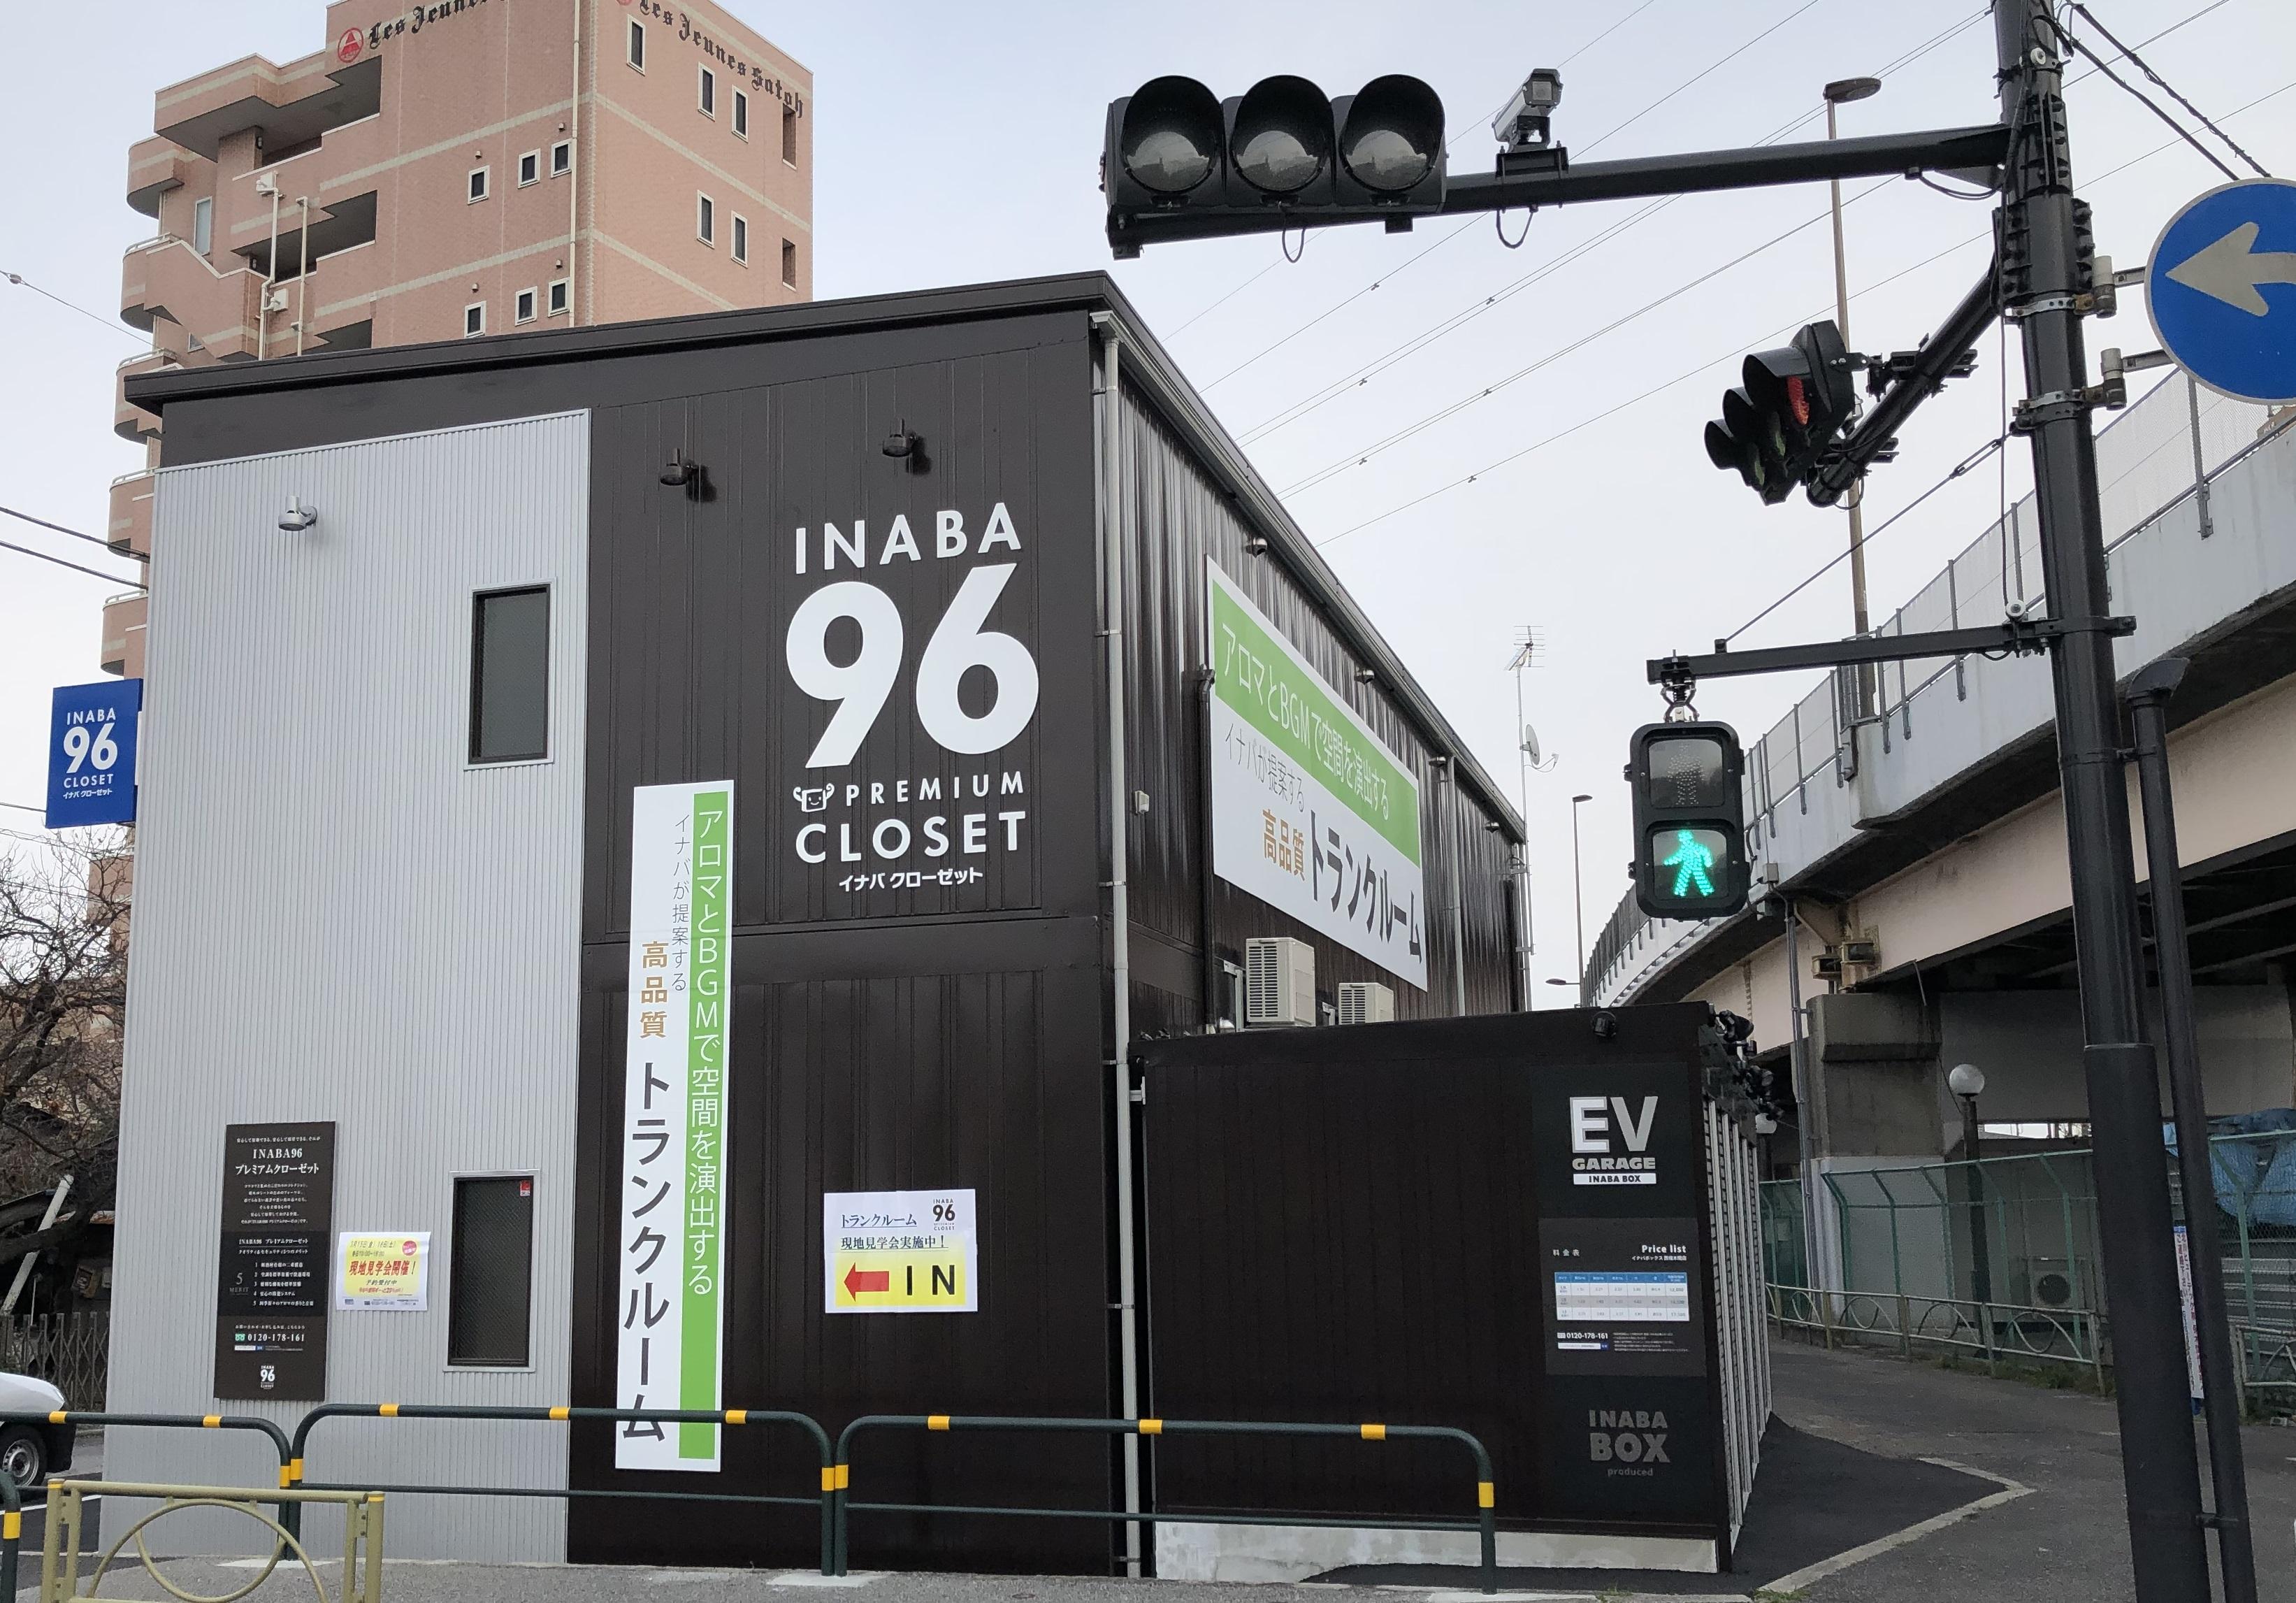 INABA96西保木間店 毛長川橋前信号の目の前です